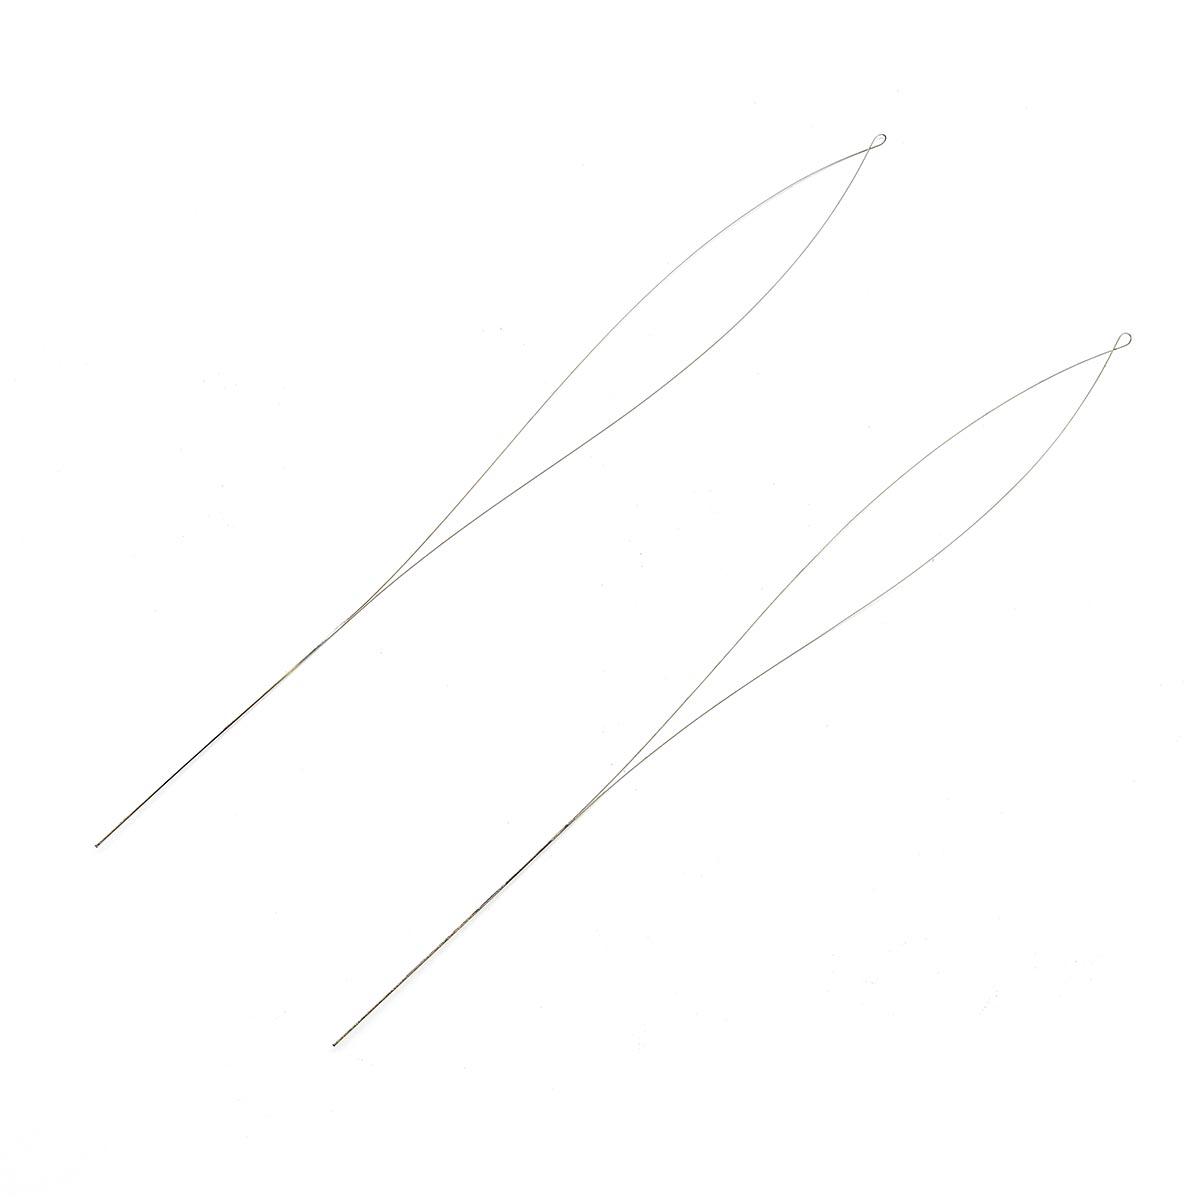 XQ009 Игла для бисера, 2 шт, Астра